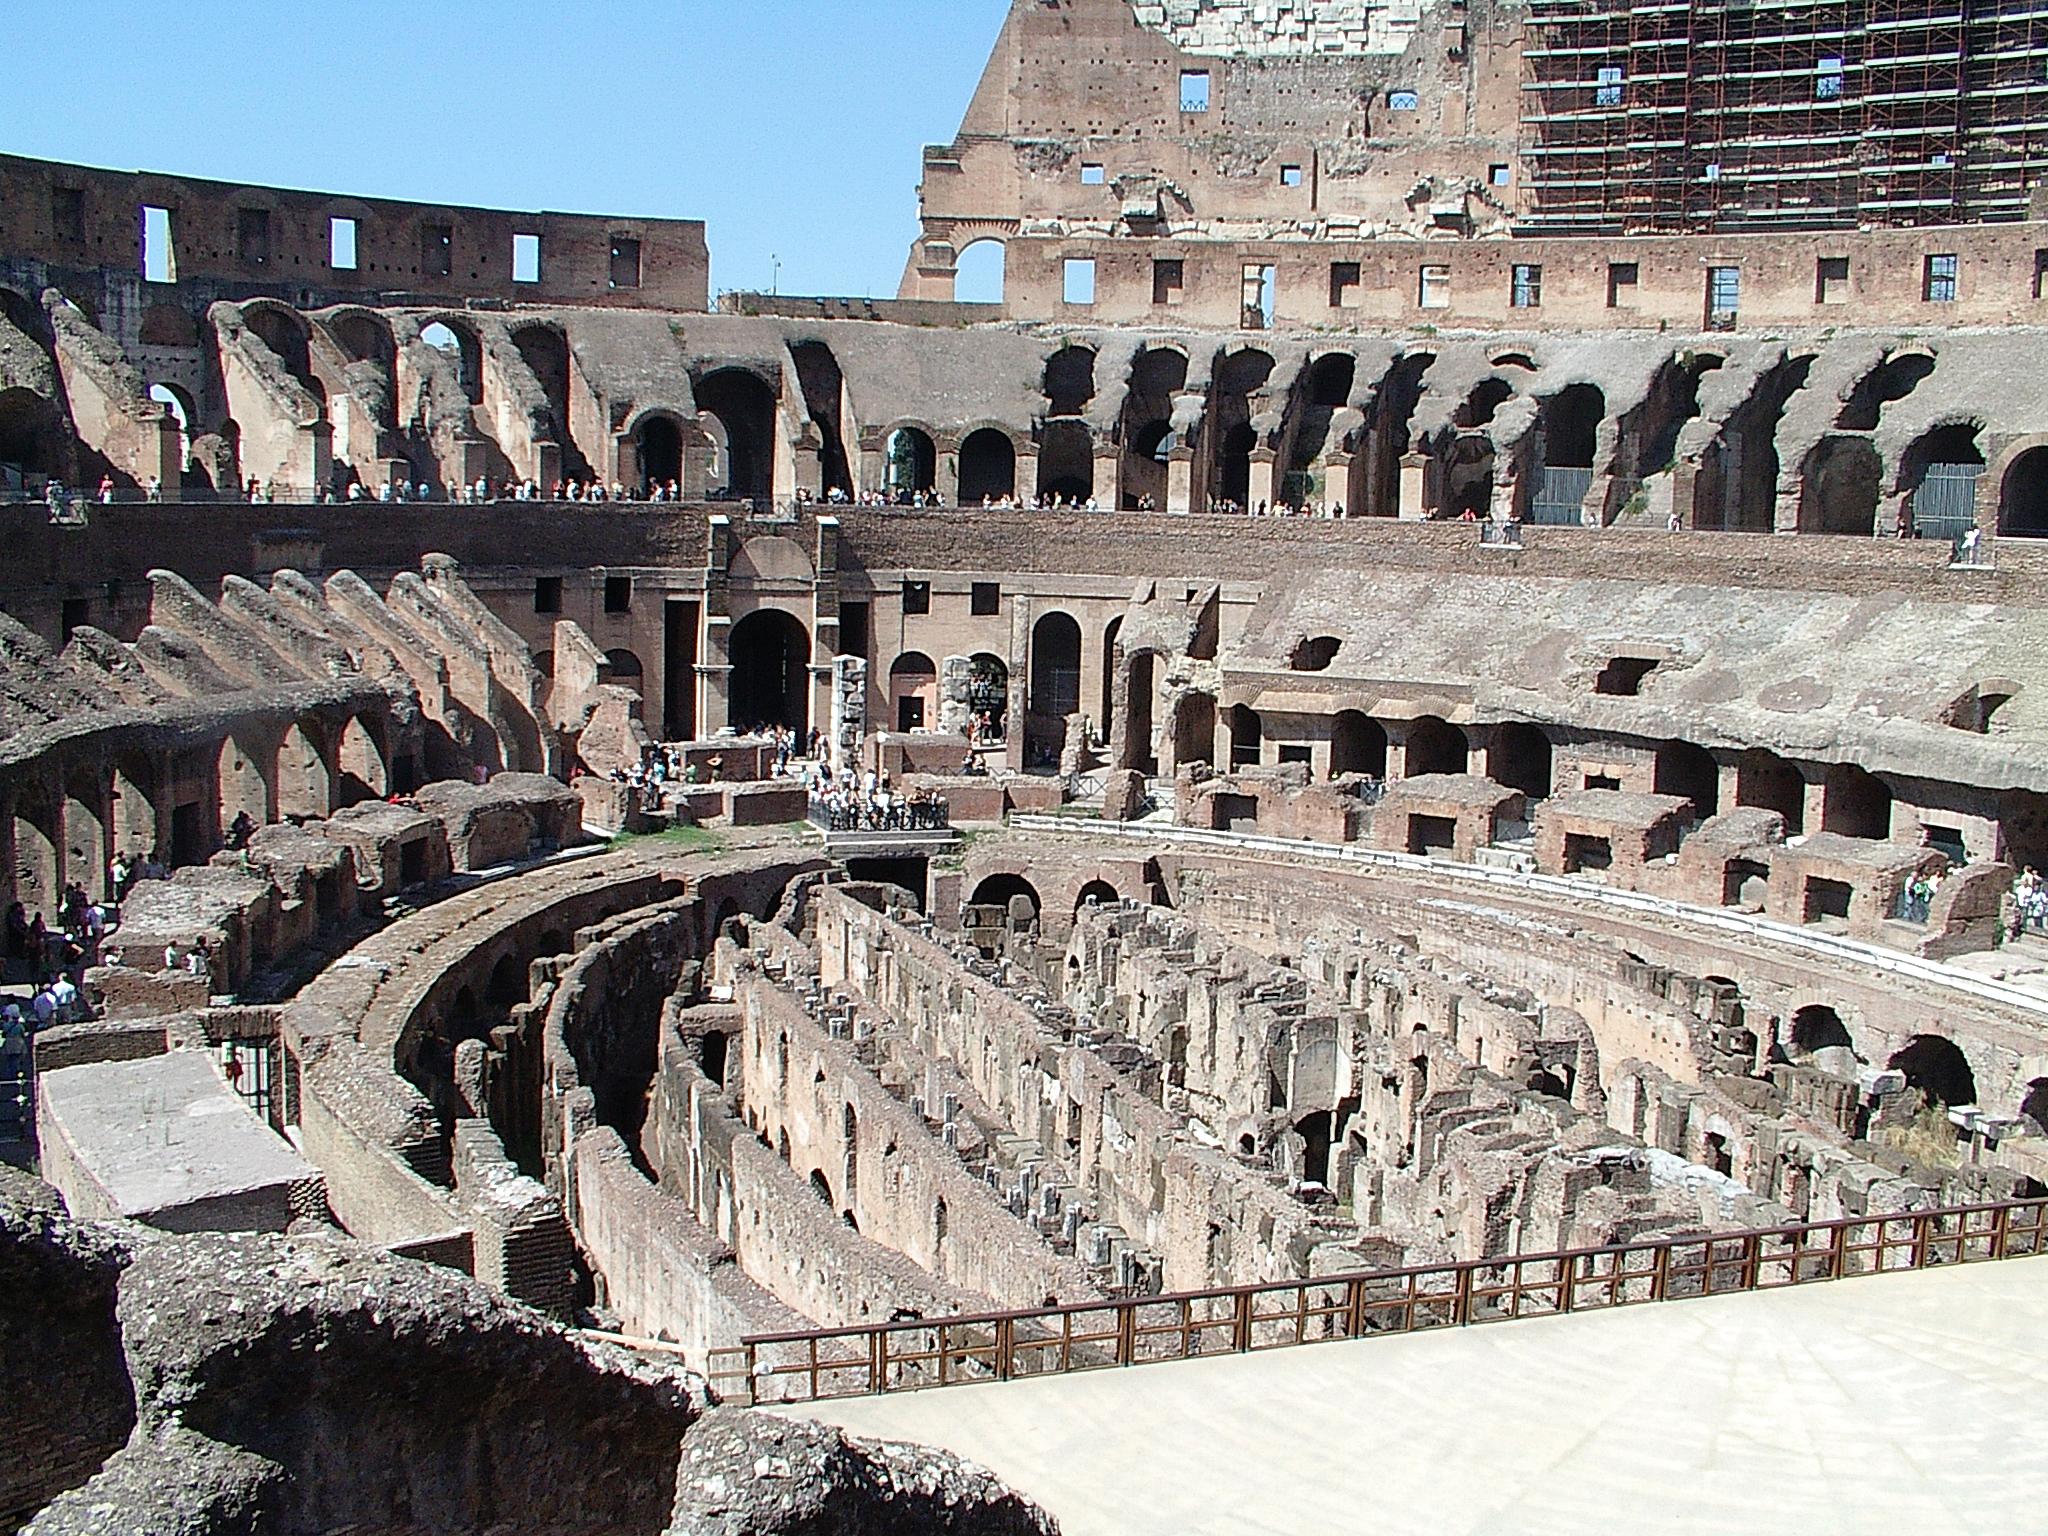 Inside Rome's Colosseum